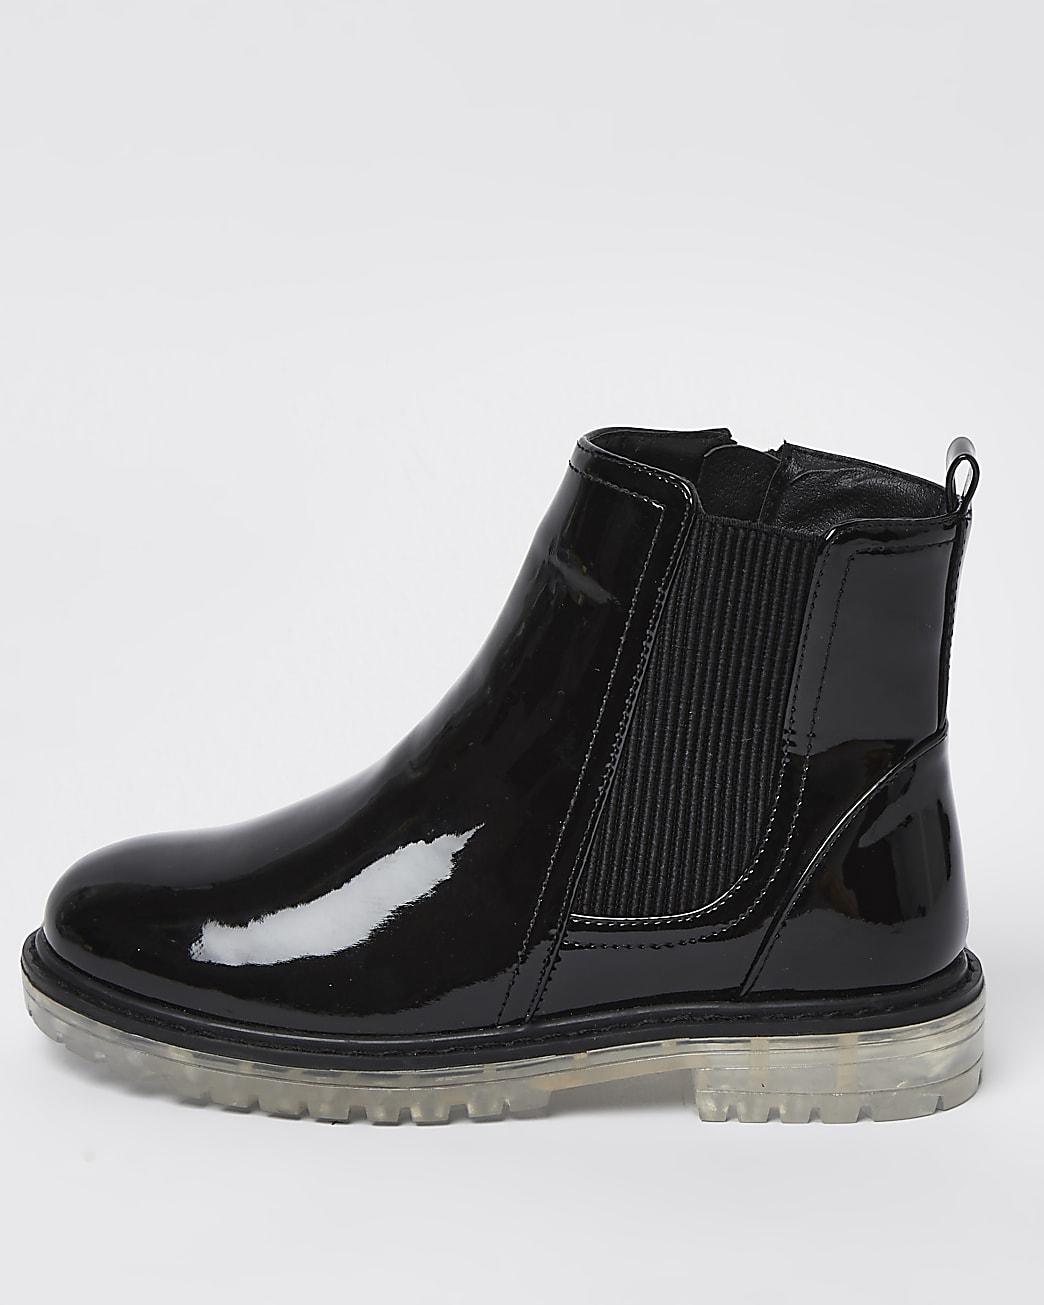 Girls black translucent sole boots